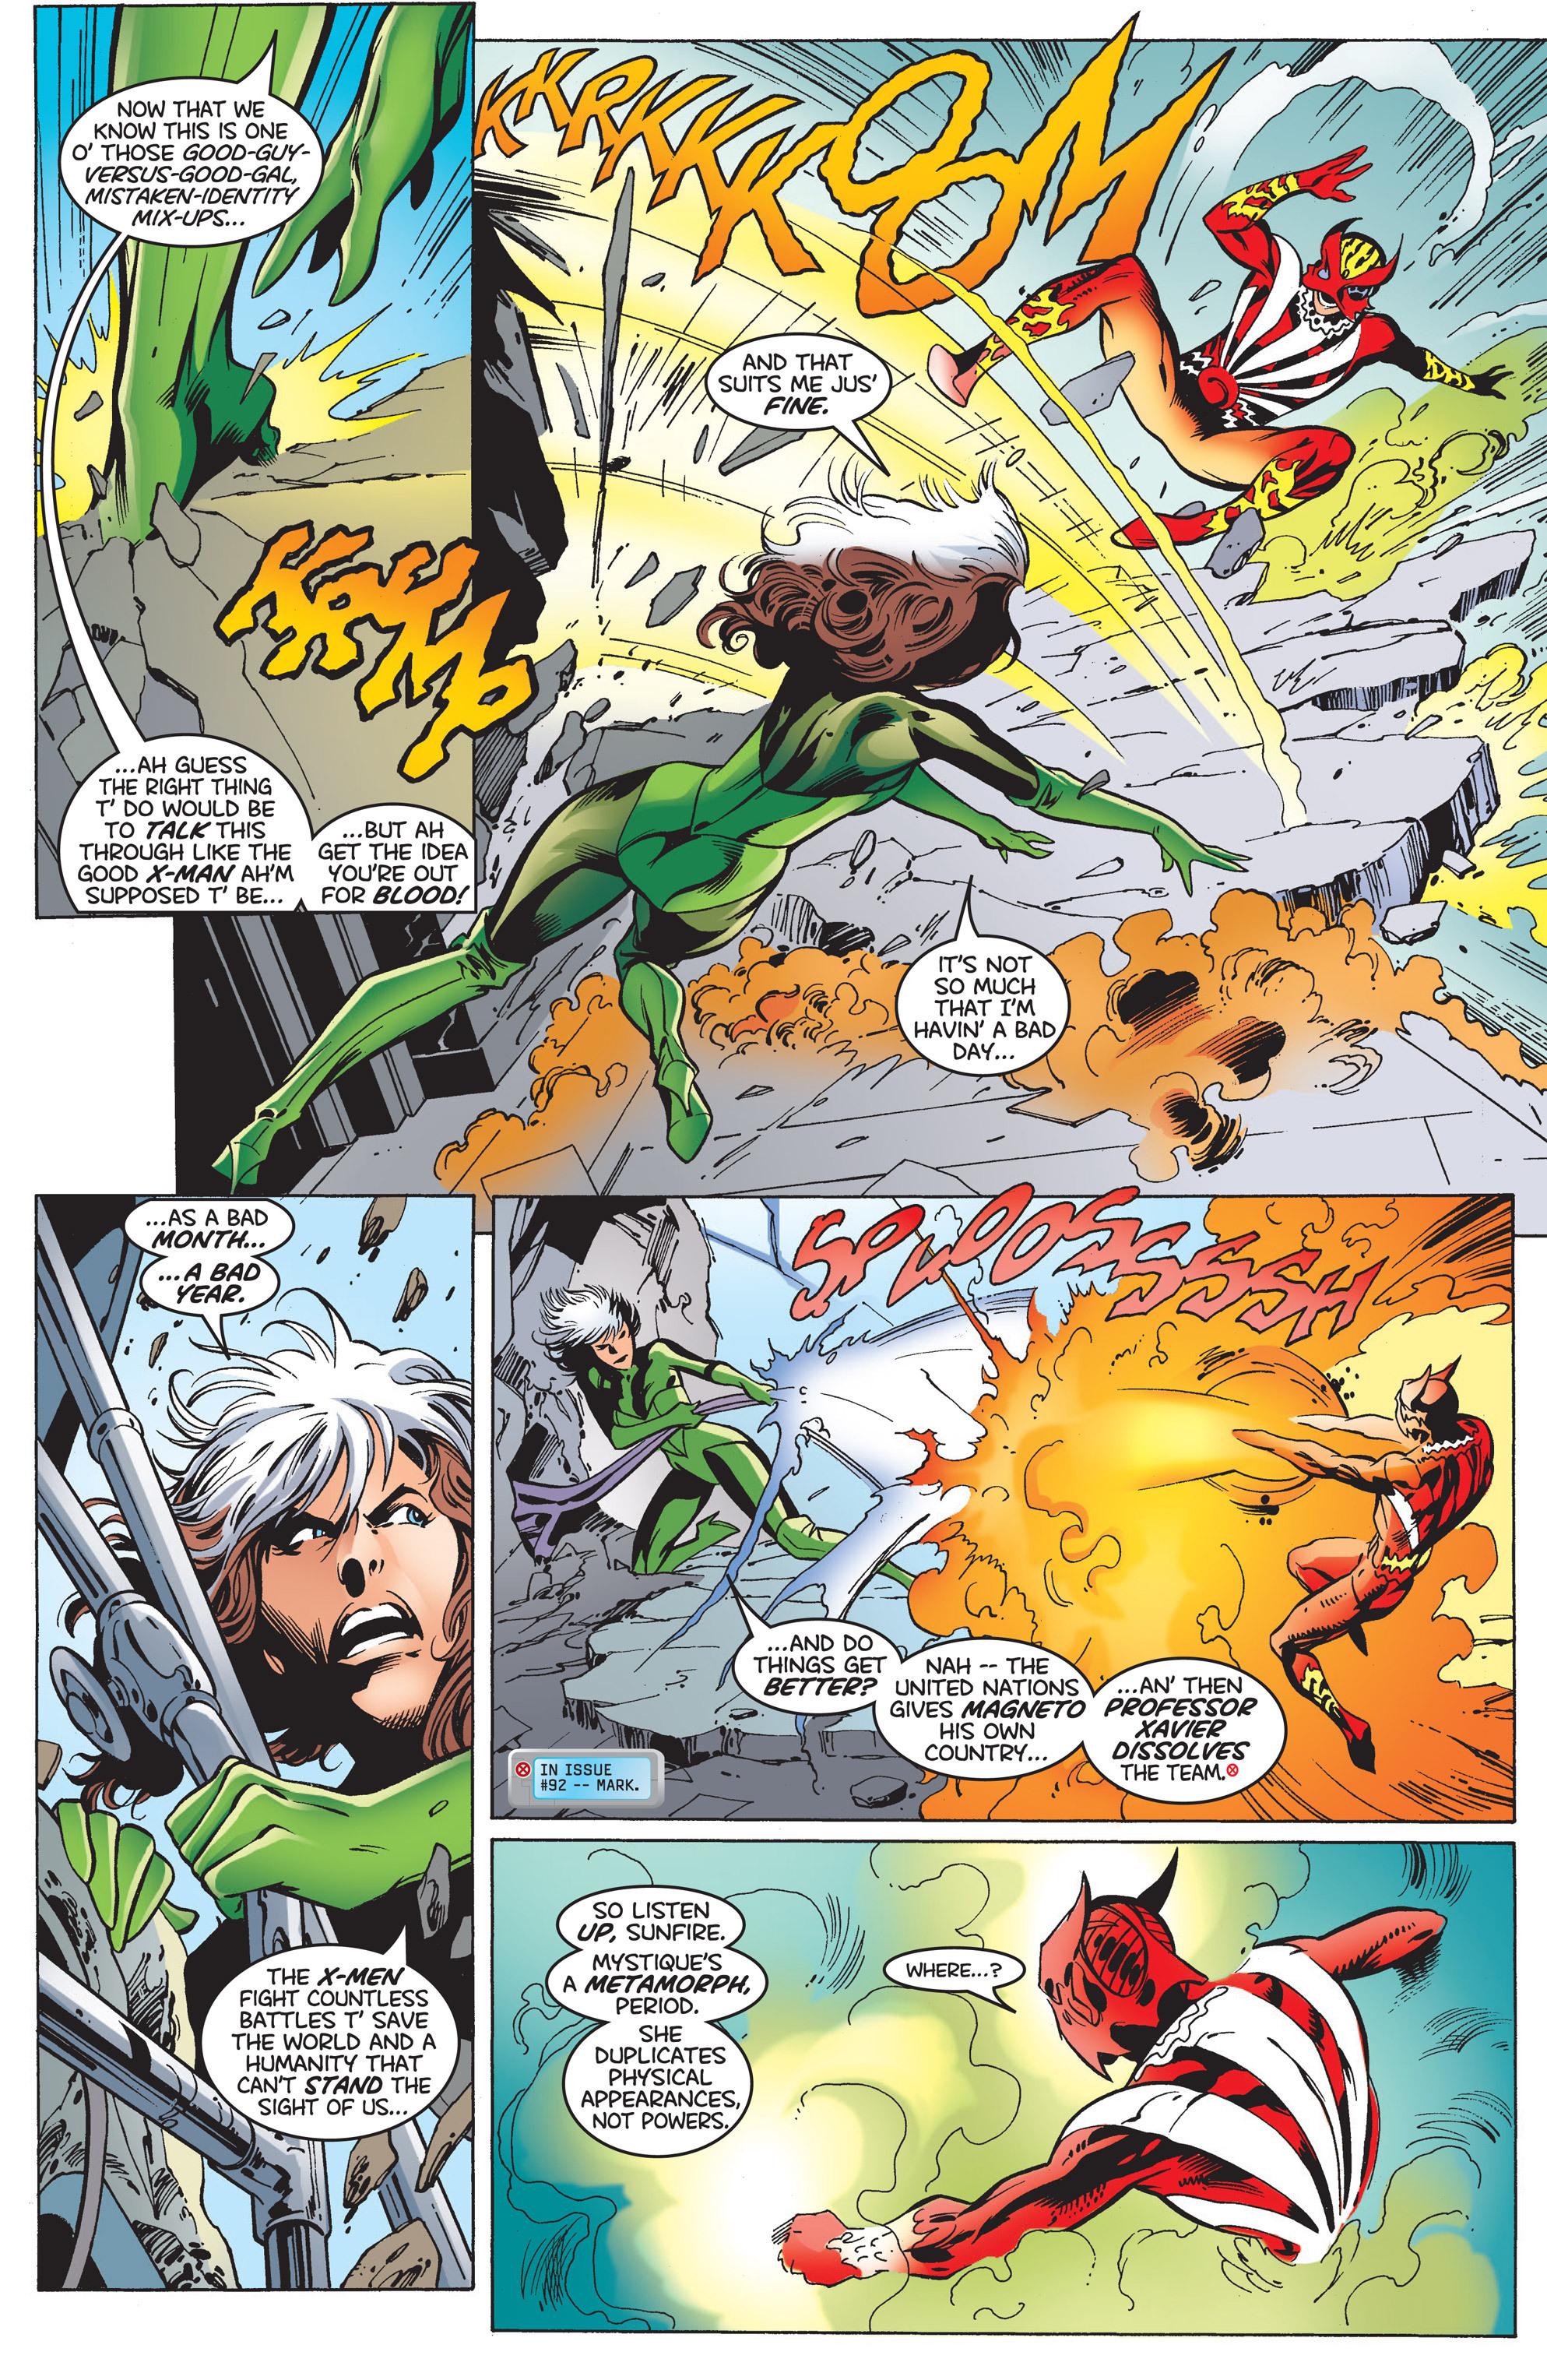 X-Men (1991) 94 Page 2